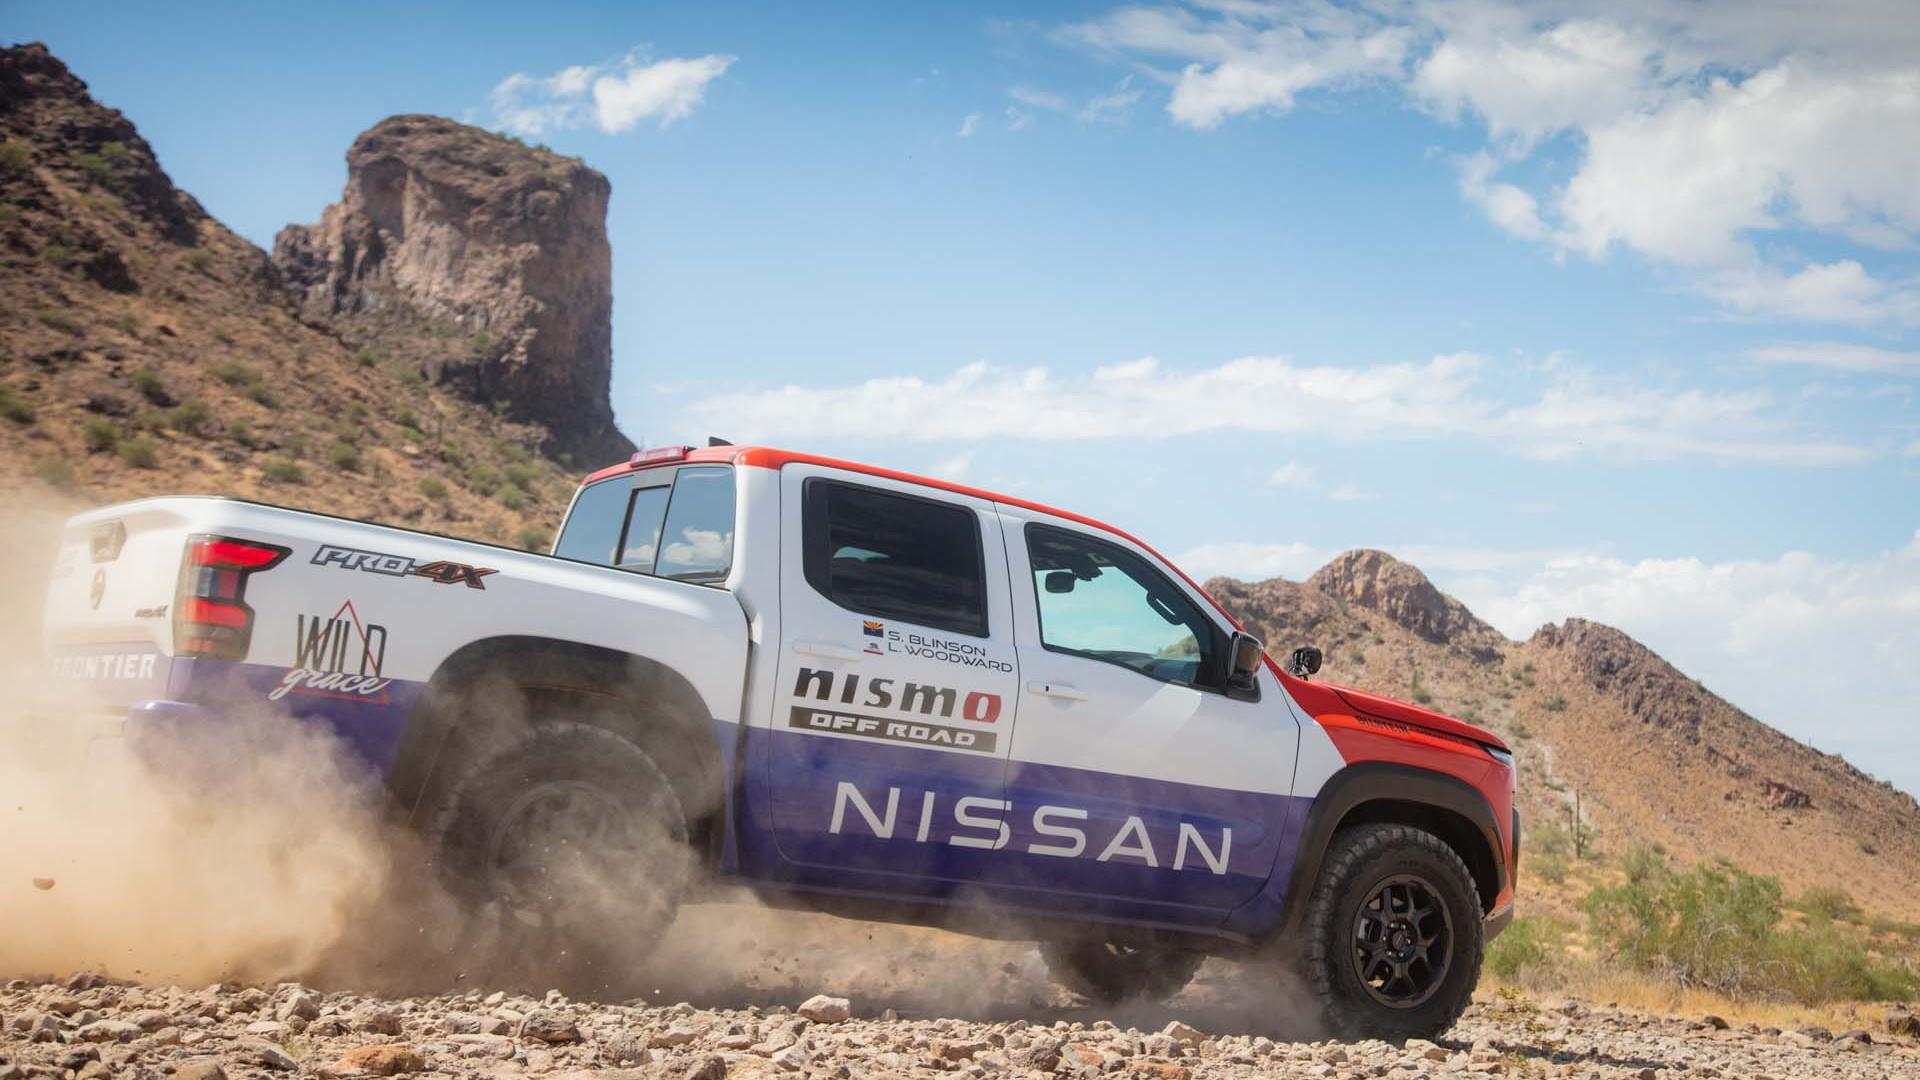 2022 Nissan Frontier Pro-4X Hardbody race truck